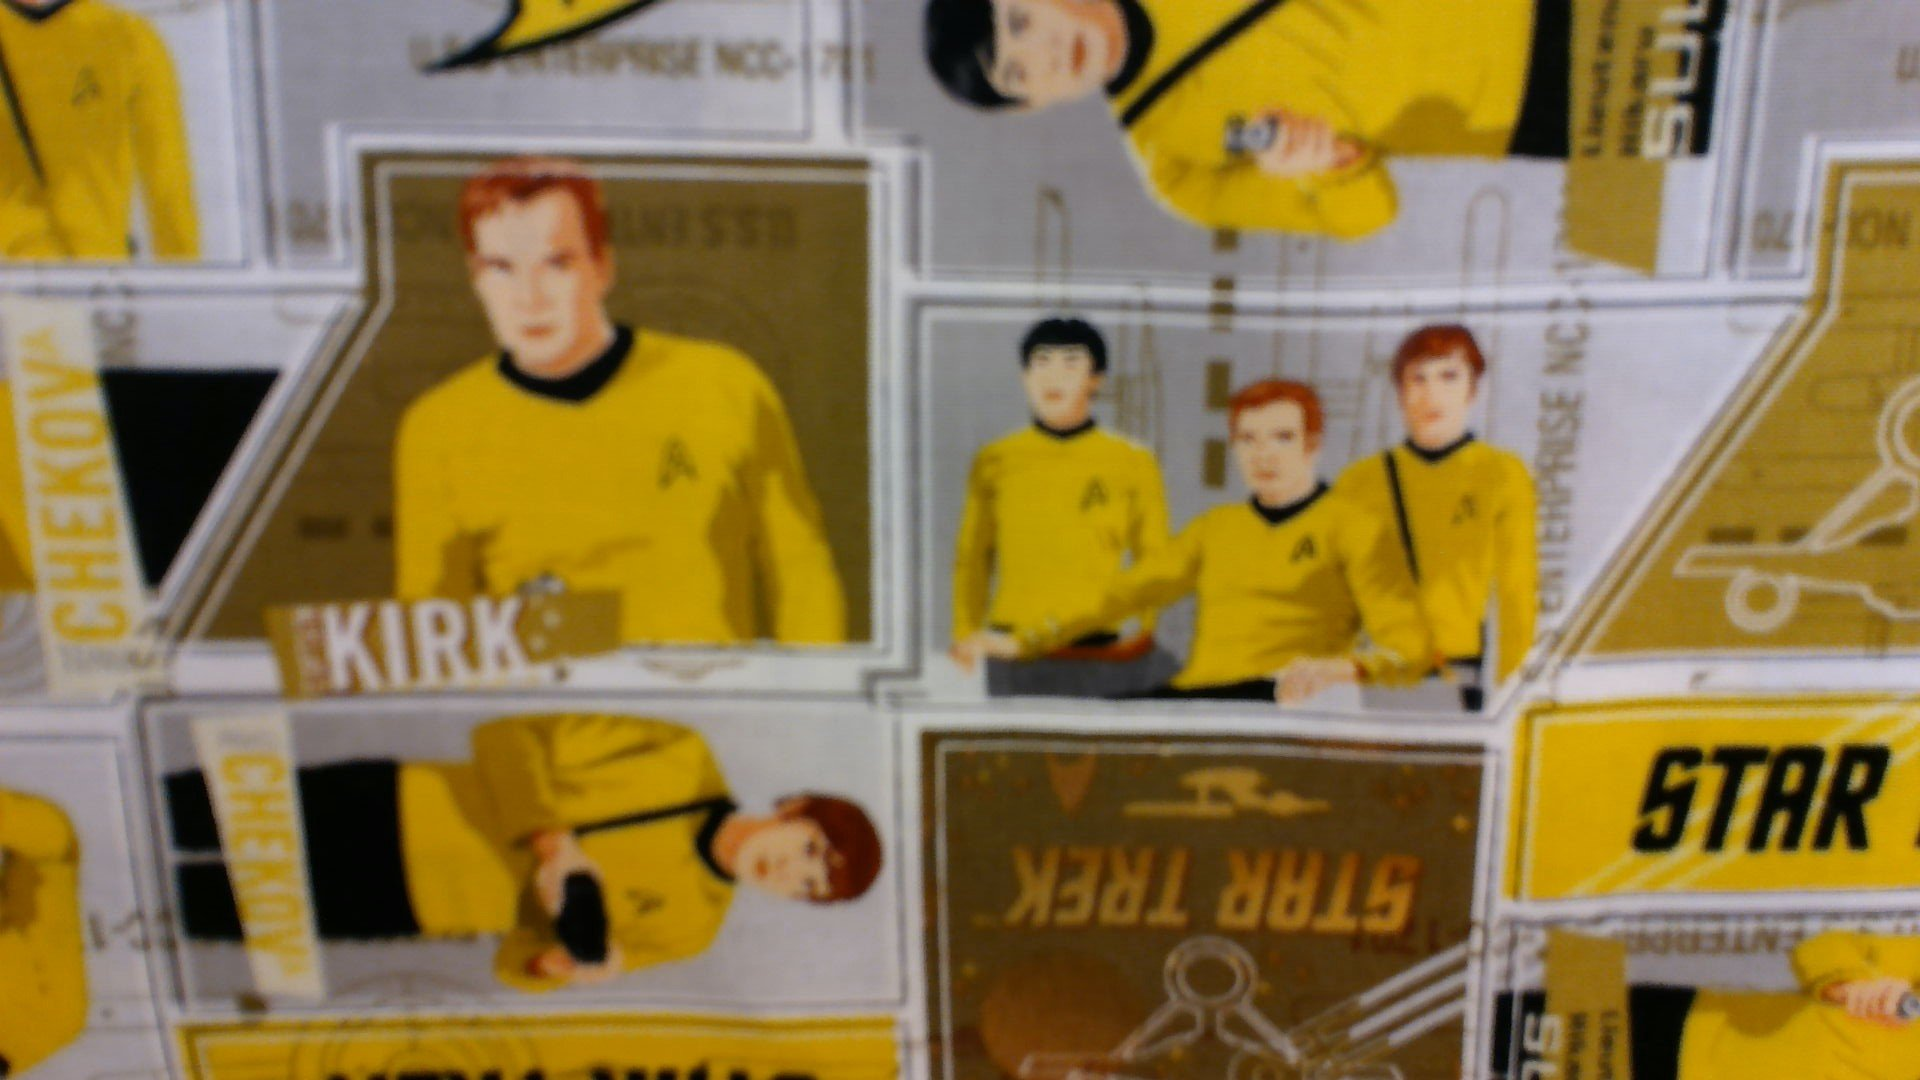 Star Trek - Yellow Uniform 63100203-1